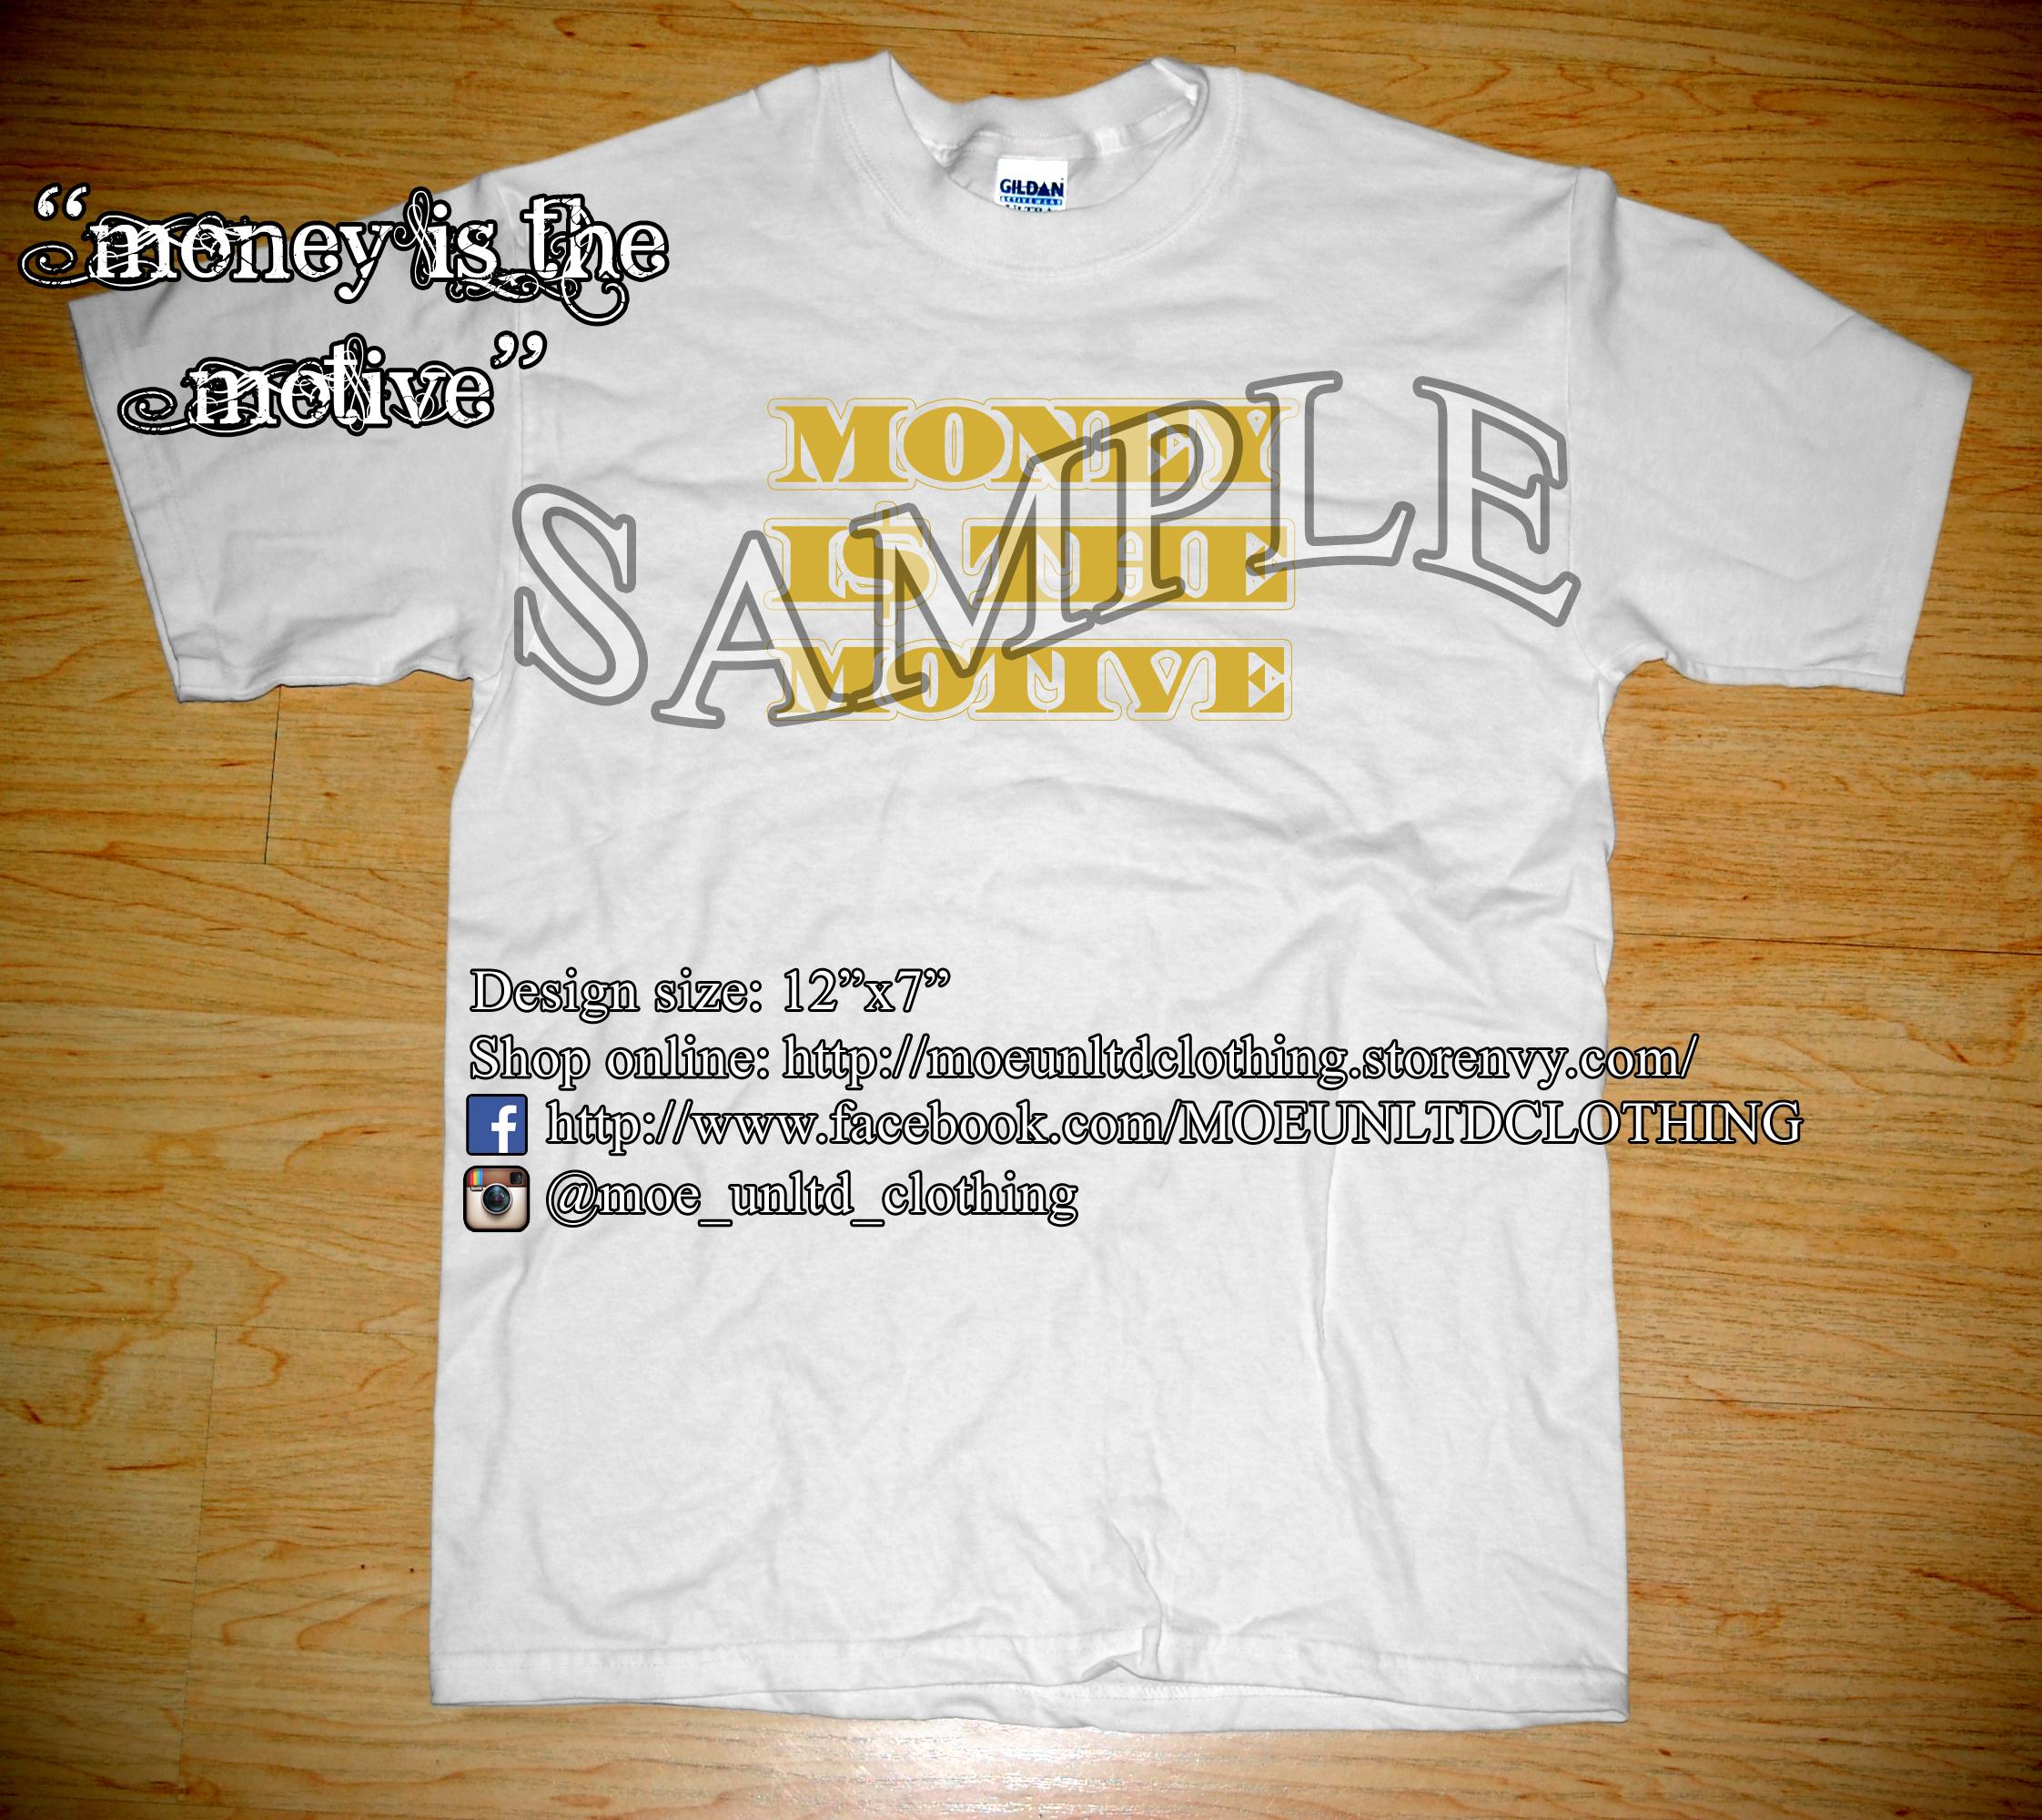 Motive clothing online